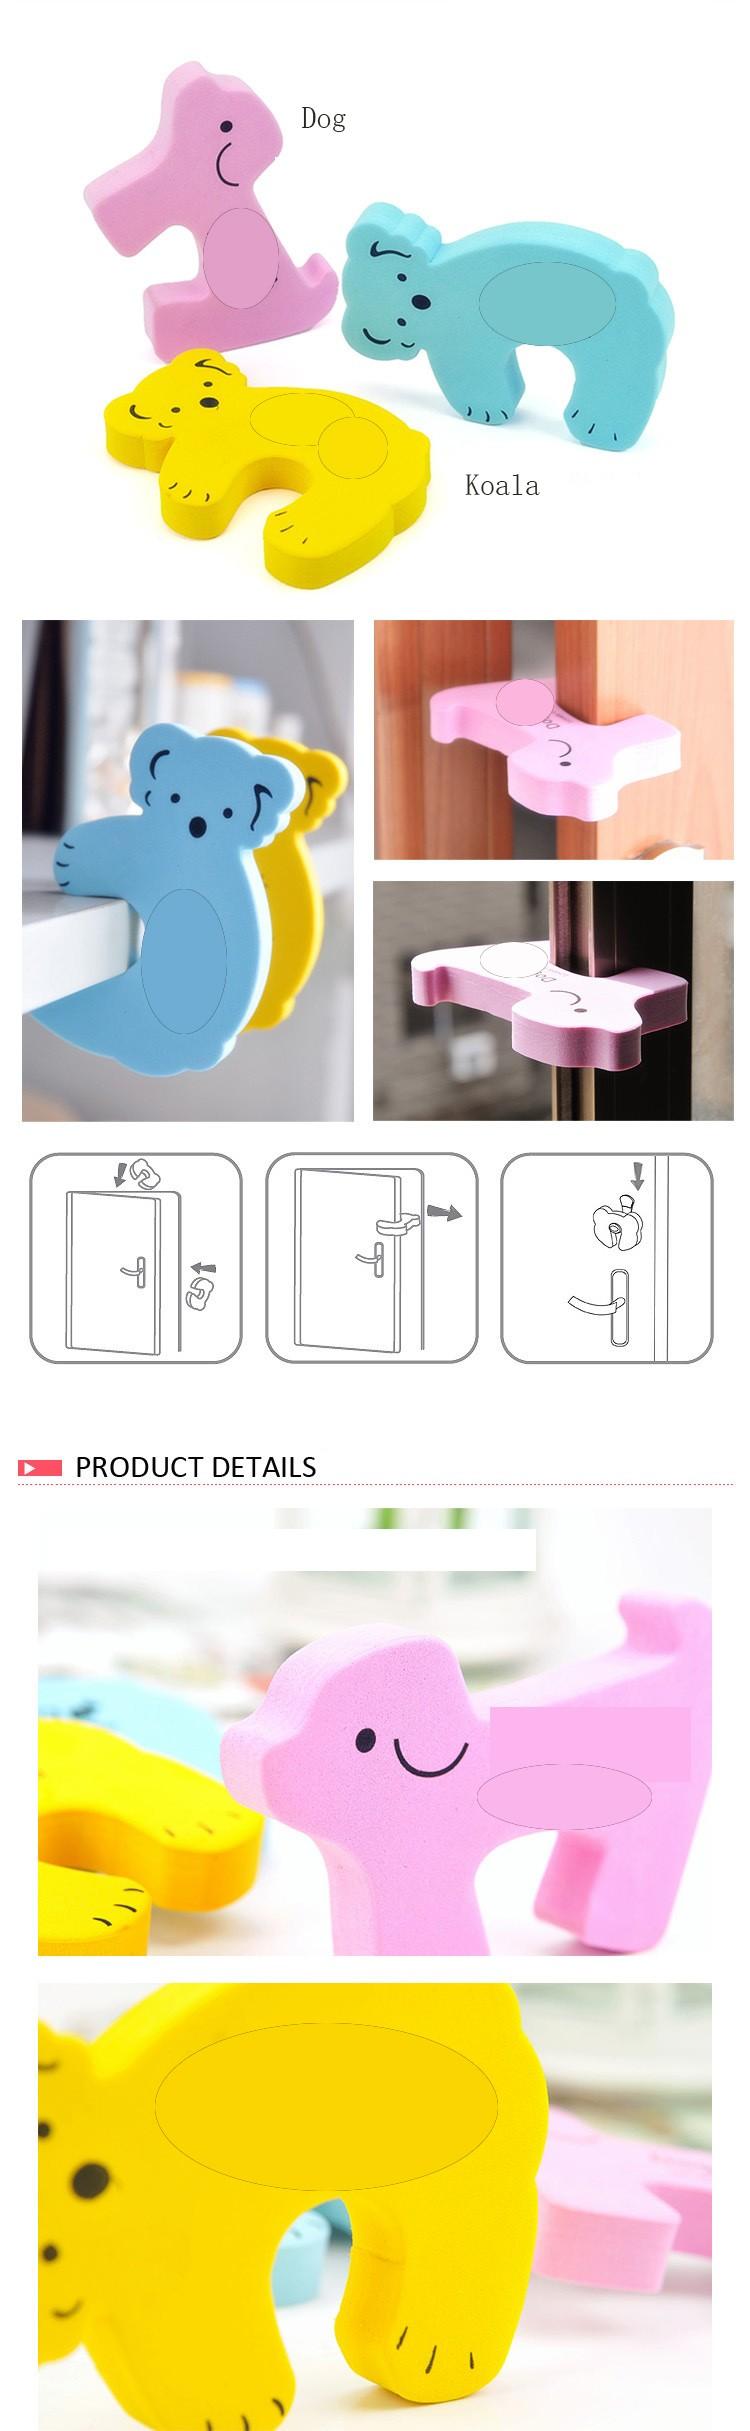 1 pcs/set On sale Koala animal shape baby finger door stopper baby door guard with excellent quality